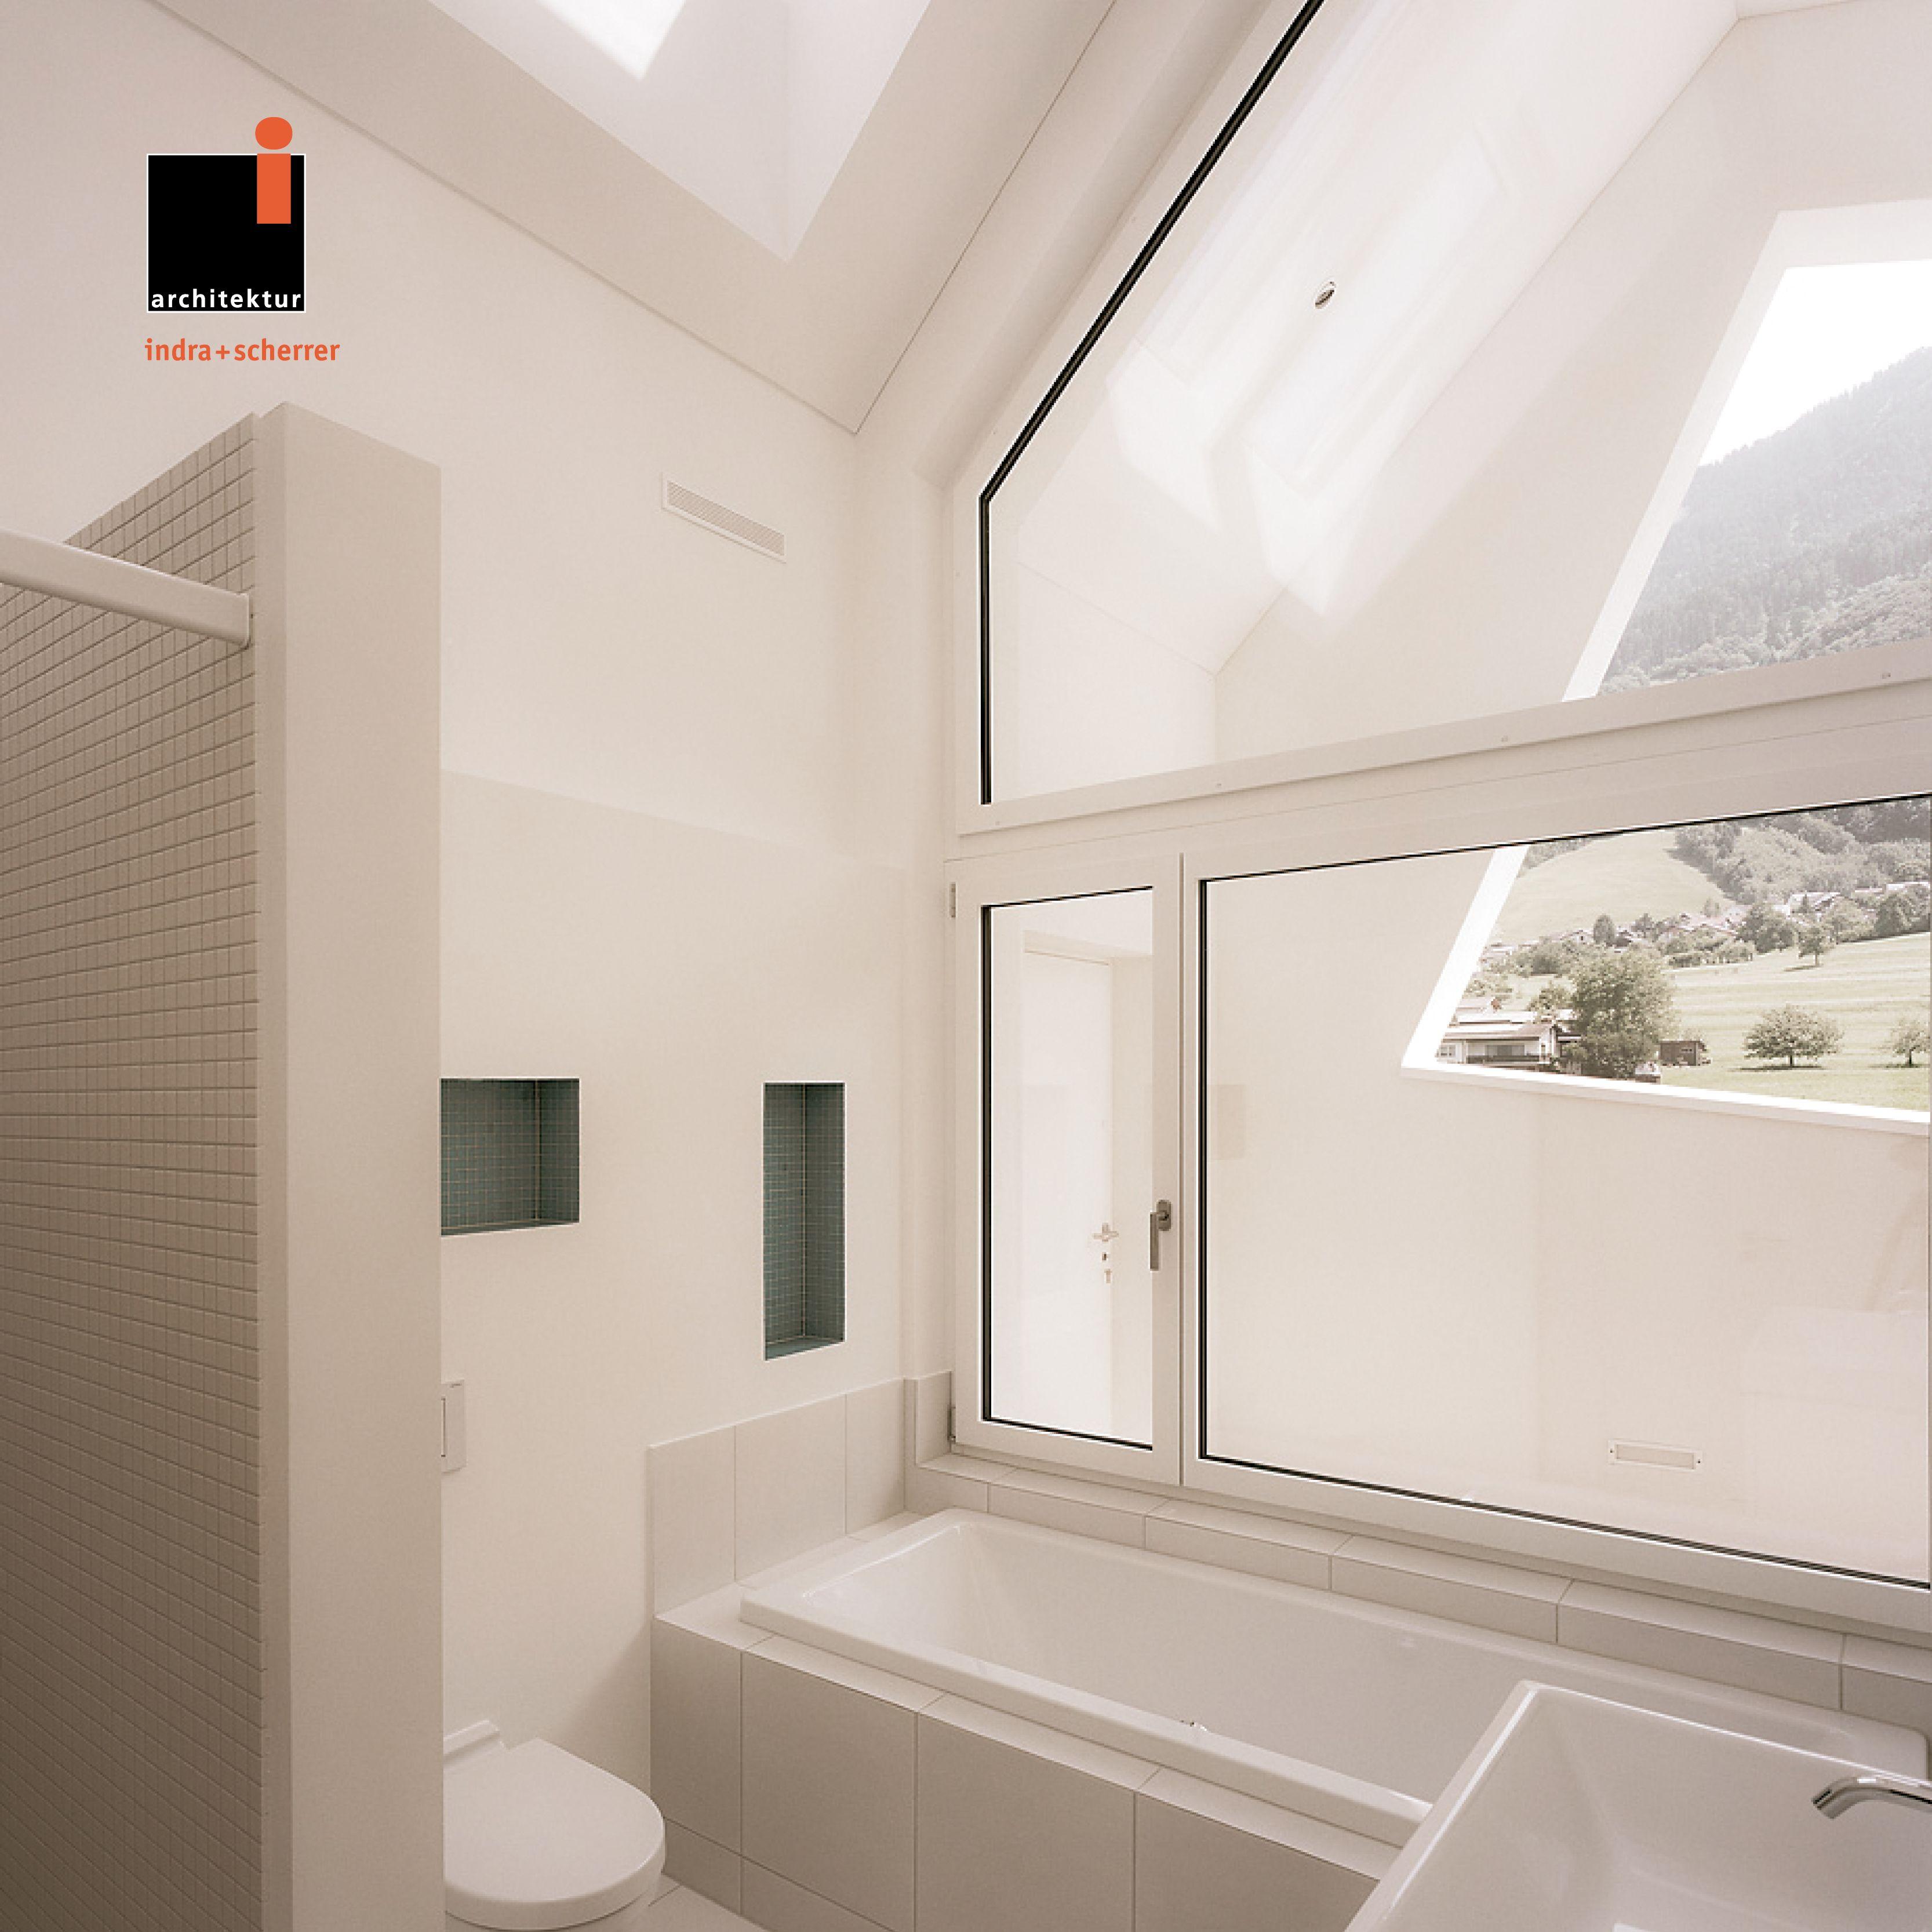 #indrascherrer #architecturephotography #architecturedesign #appartmentdesign #topfloor #topfloordesign #bathroom #interiordesign #bathroomview #deconstructivism